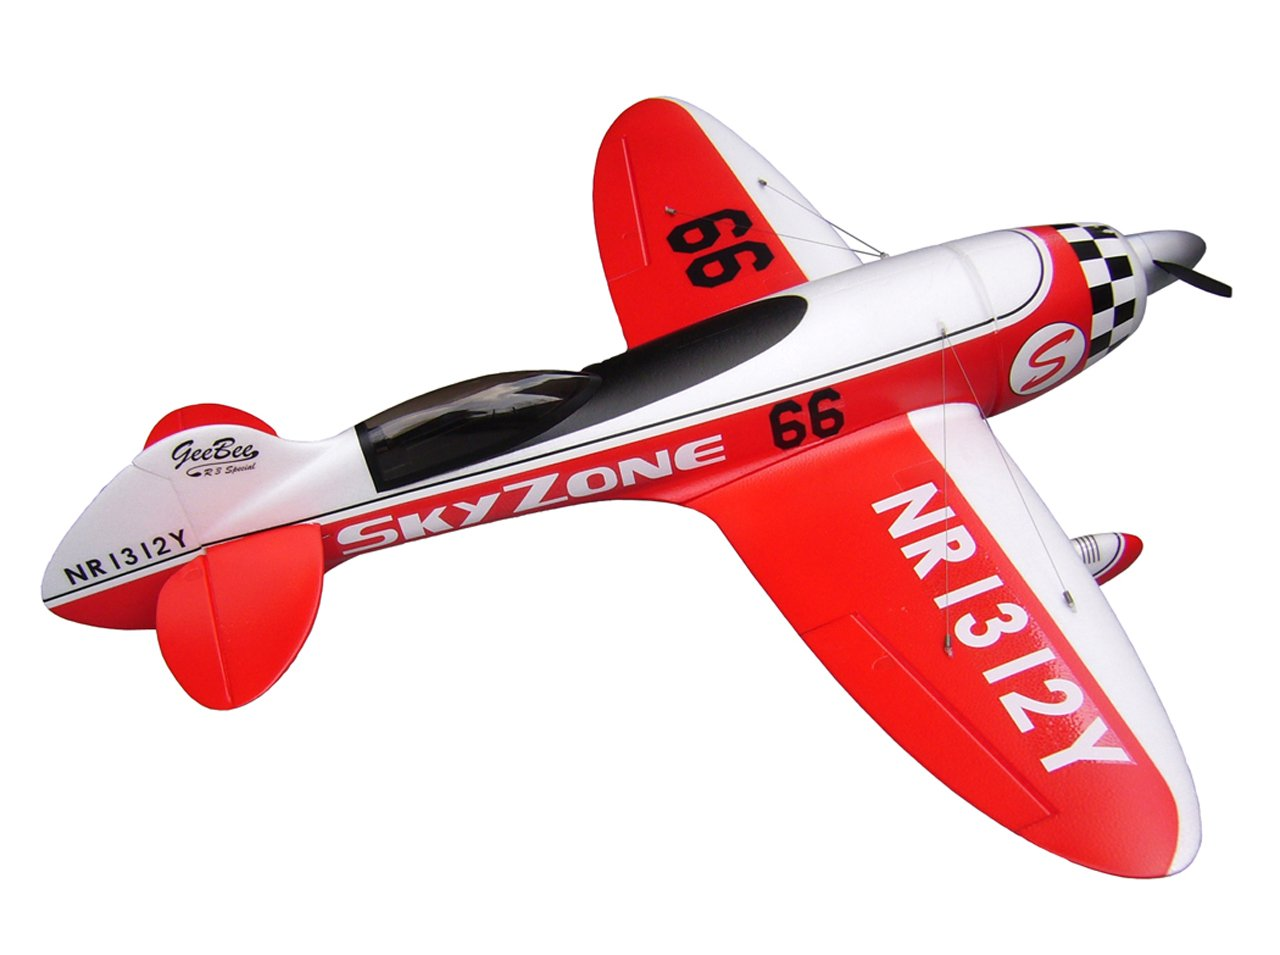 Gee Bee R3 Special Skyzone